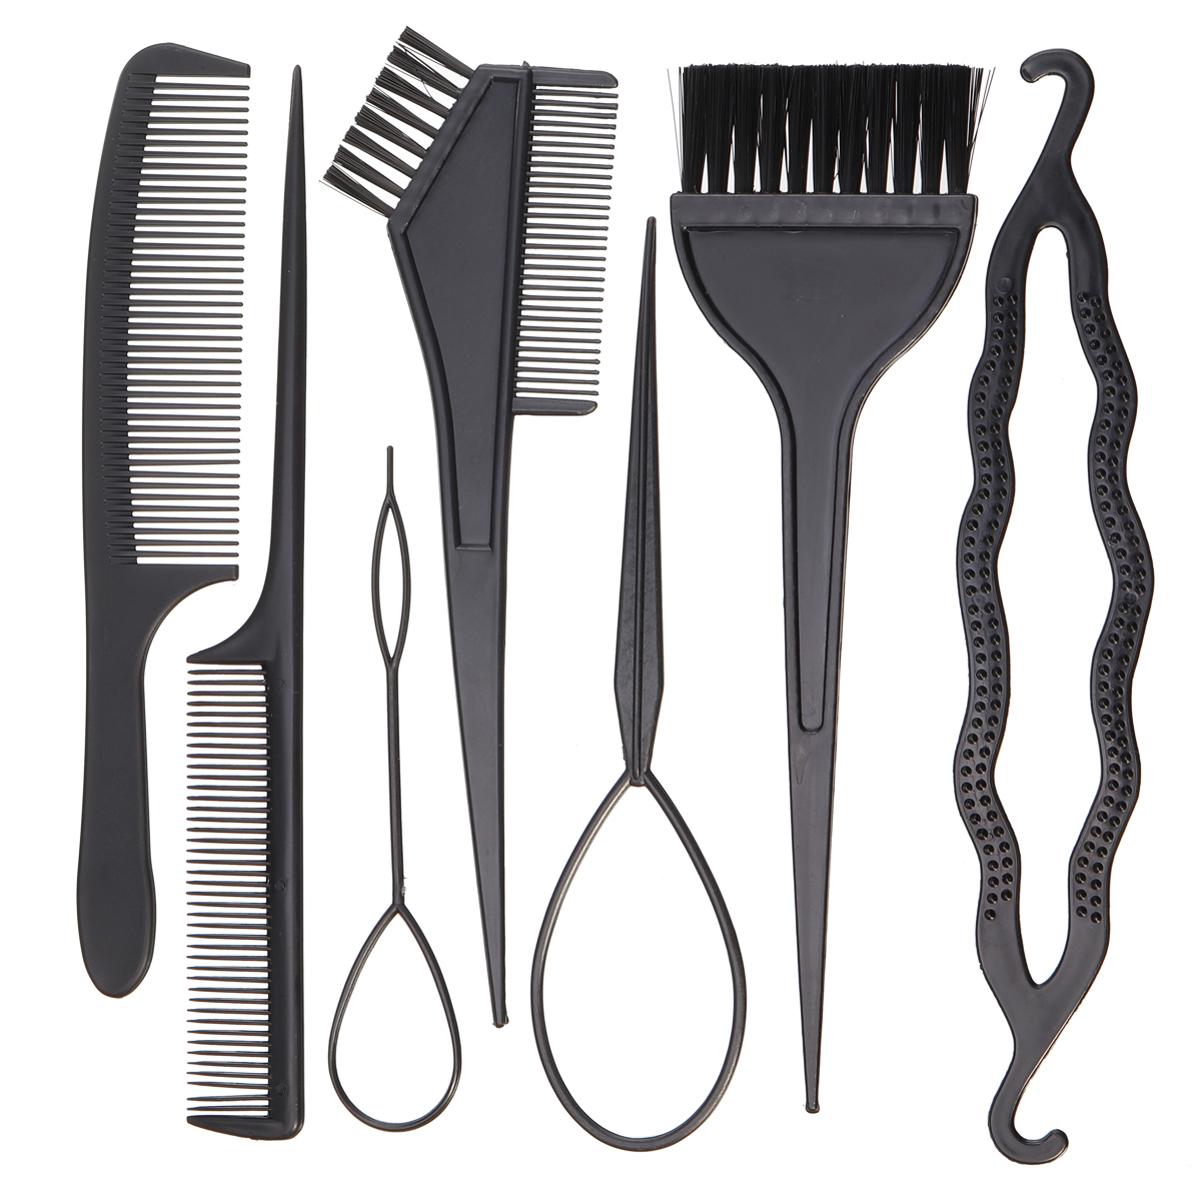 7 unids / set Magia Trenzado de cabello Teñido Torcido Enderezar Styling Tool Braiders Pull Hair Needle Brush Combs Diy Set